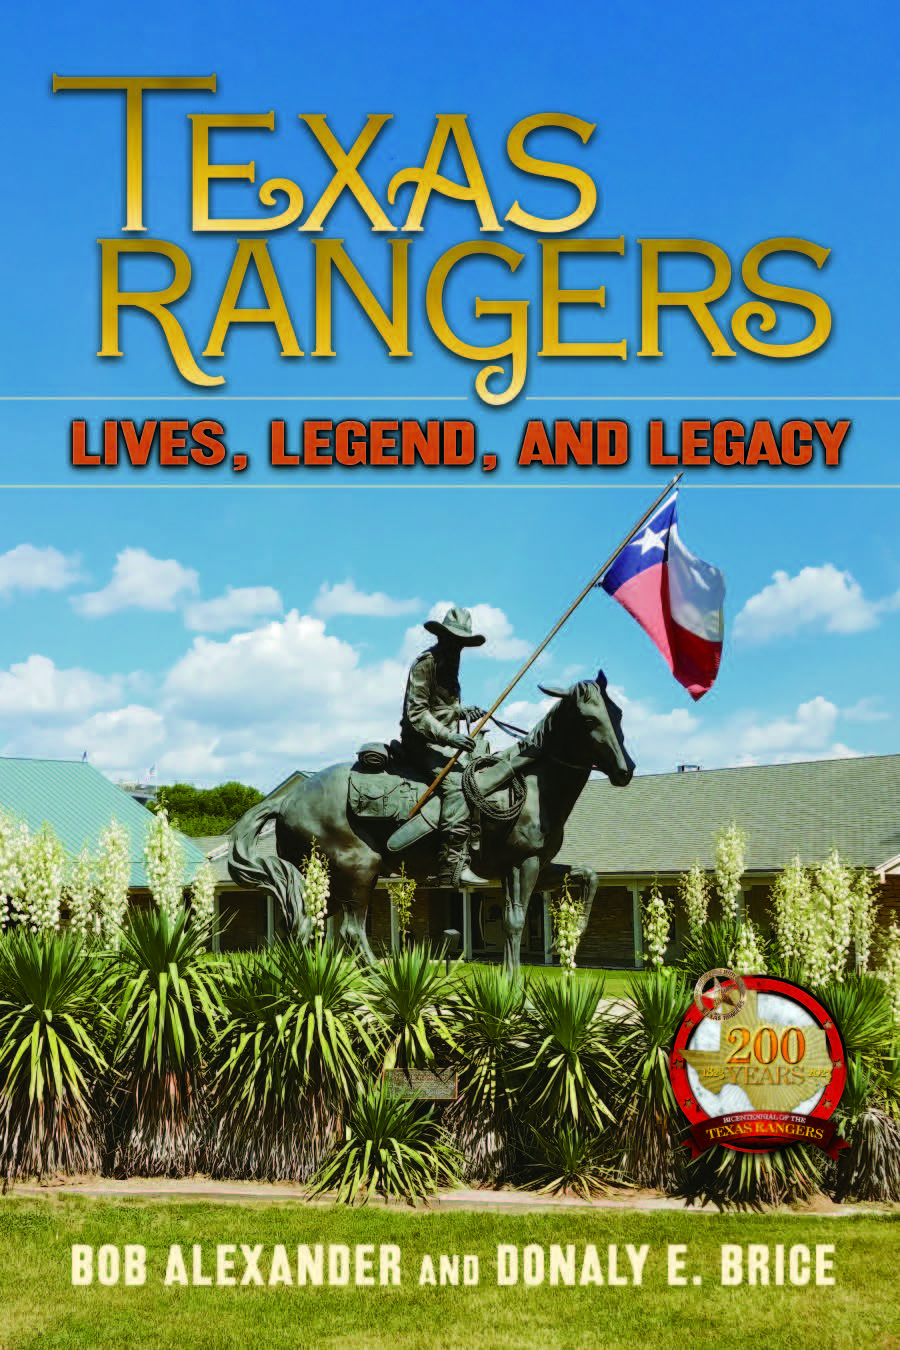 Alexander Texas Rangers w logo